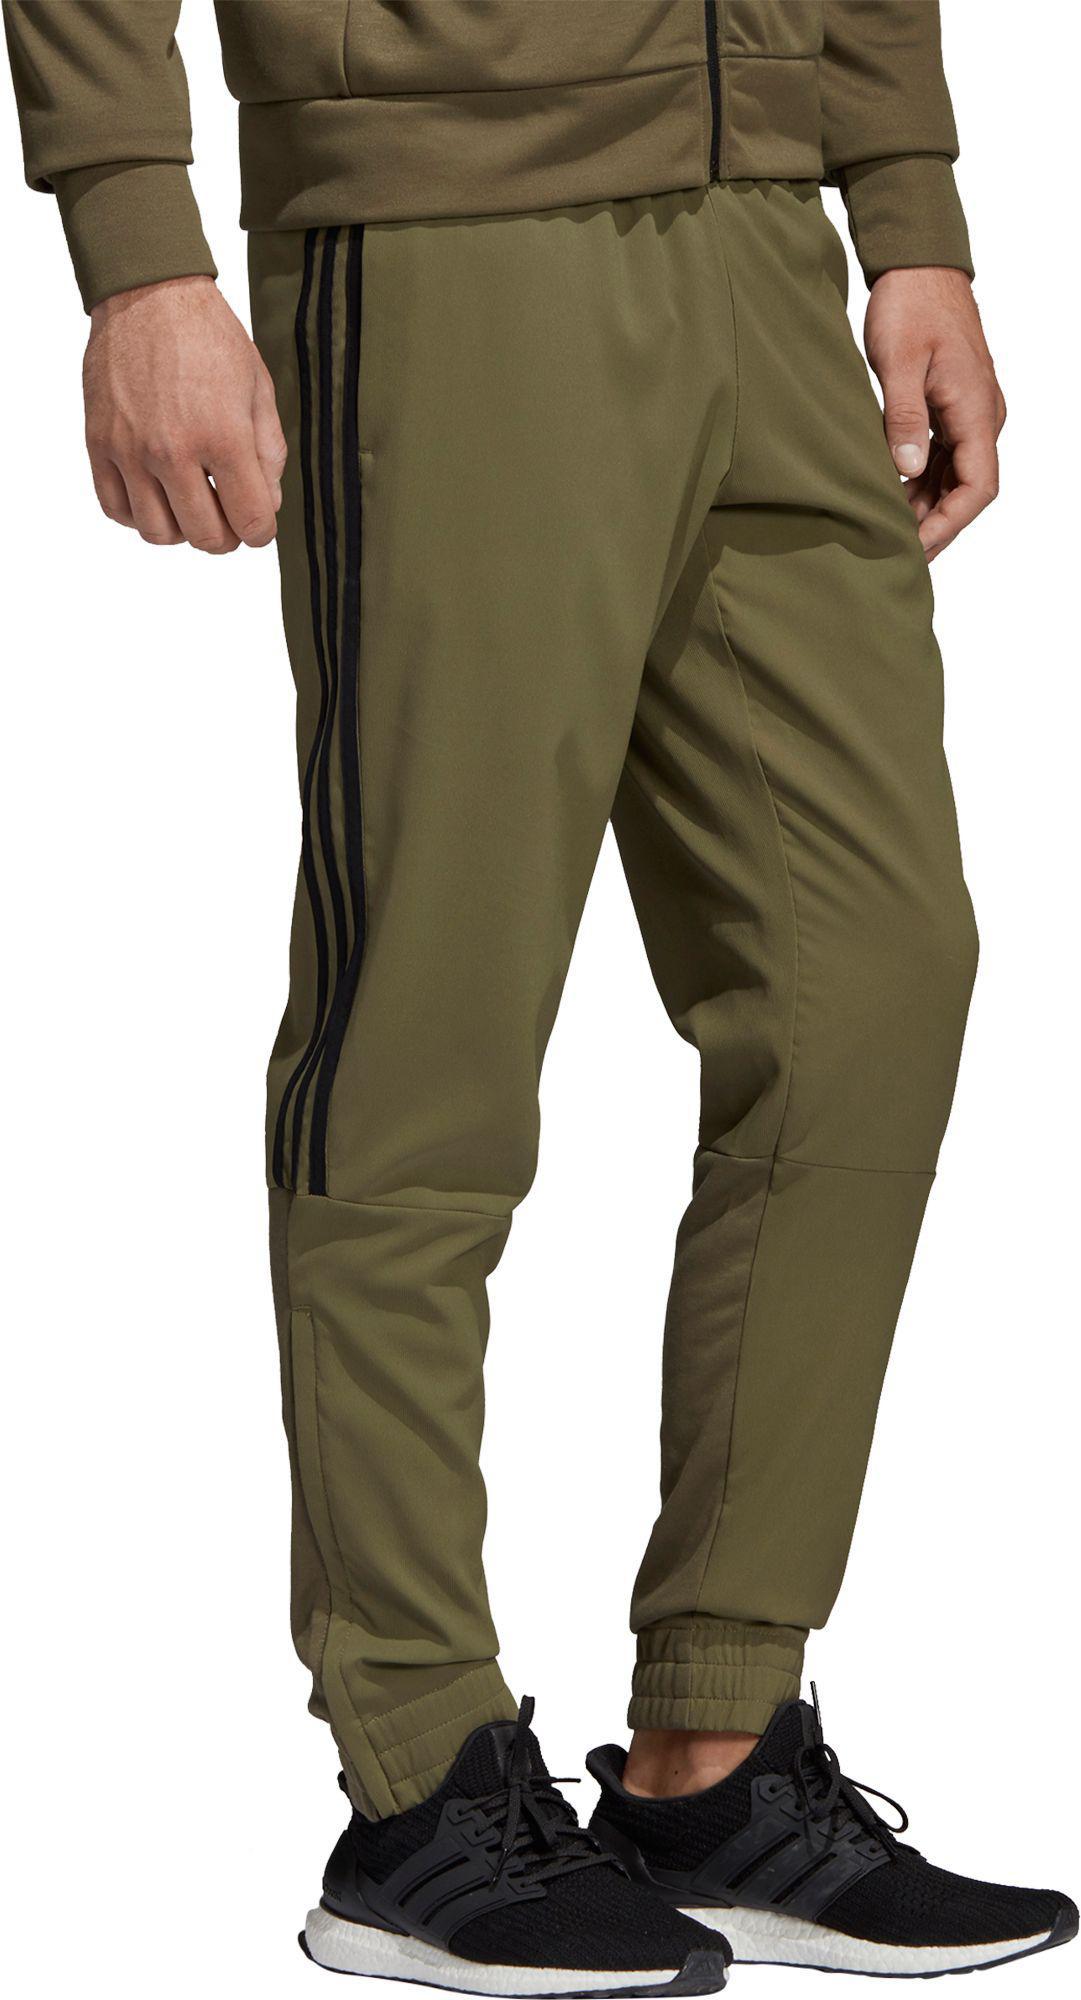 675e8d60 adidas Sport Id Tiro Woven Pants in Green for Men - Lyst